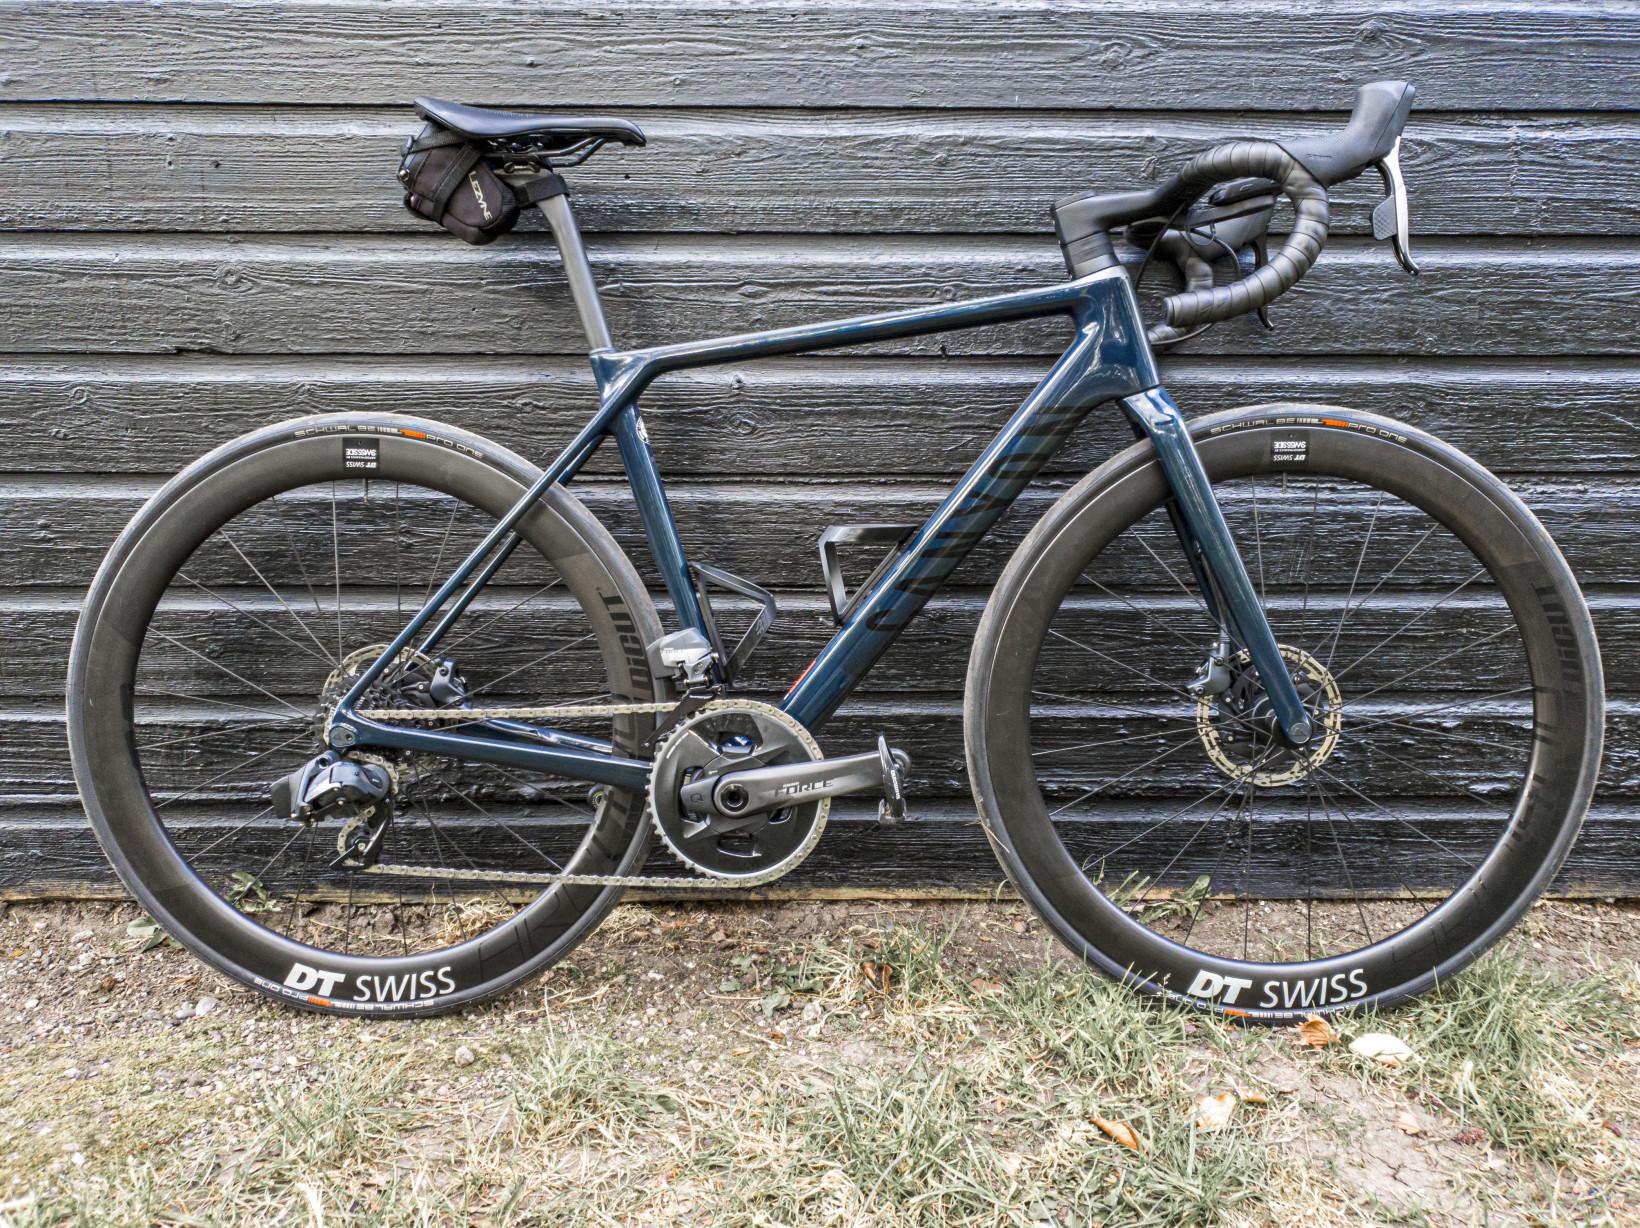 canyon, ultimate, cf, slx, bike, race